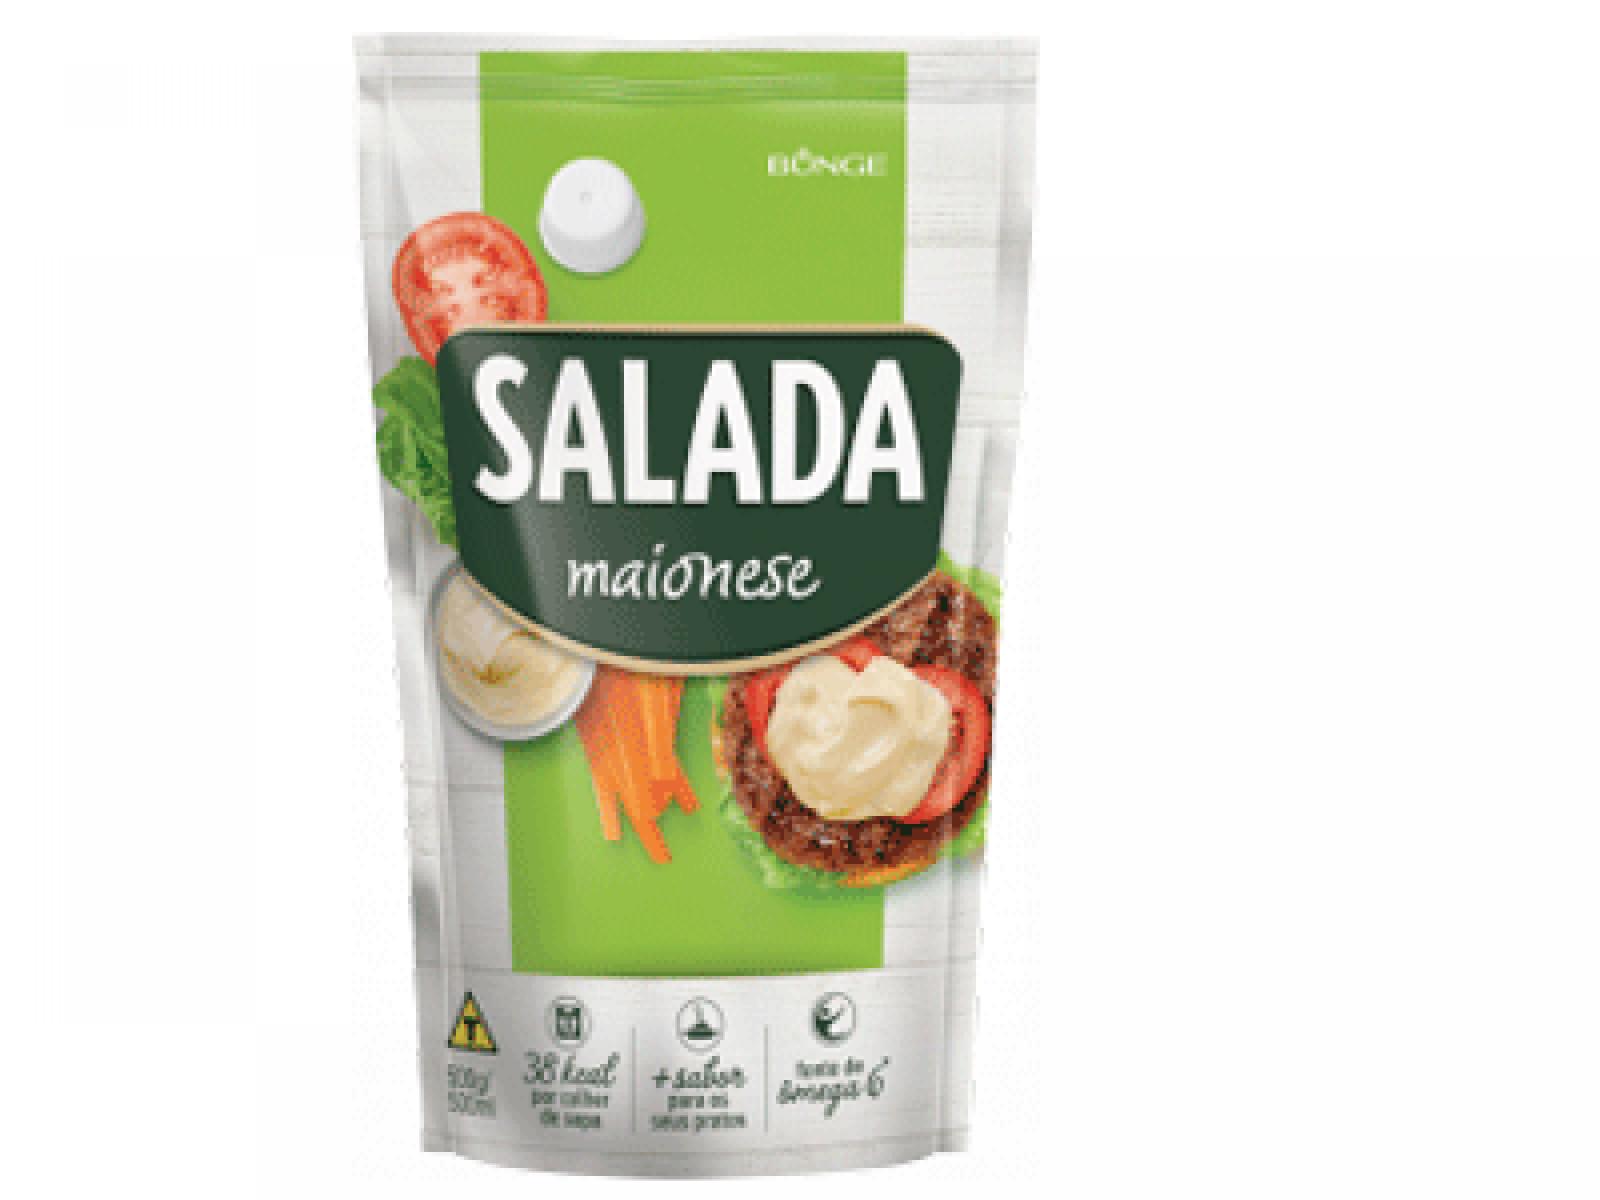 Maionese Salada Sache 200g